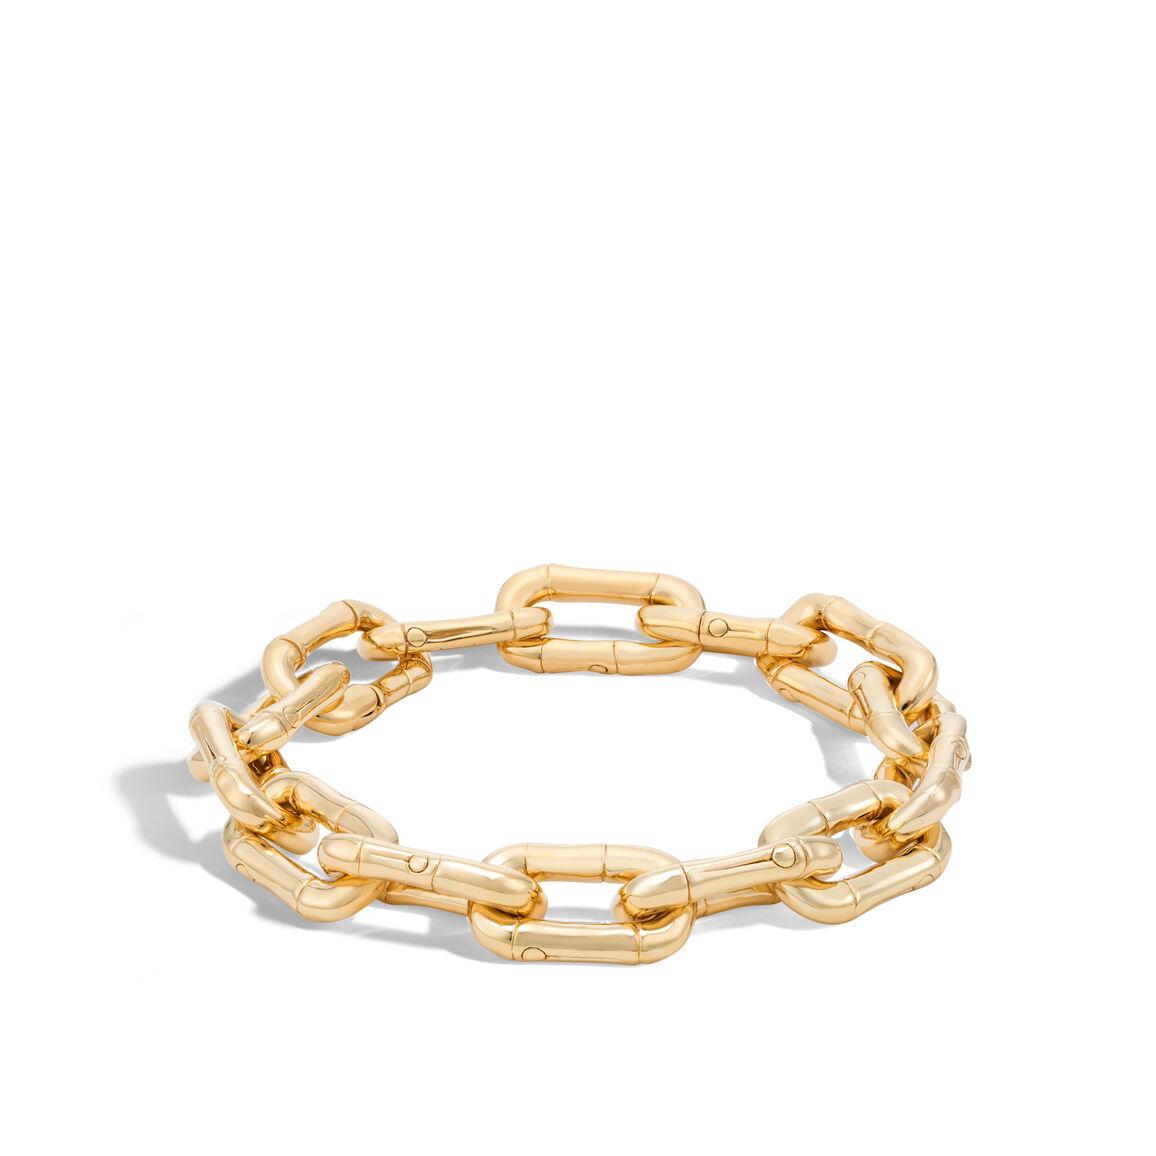 Bamboo 10.5MM Link Bracelet in 18K Gold